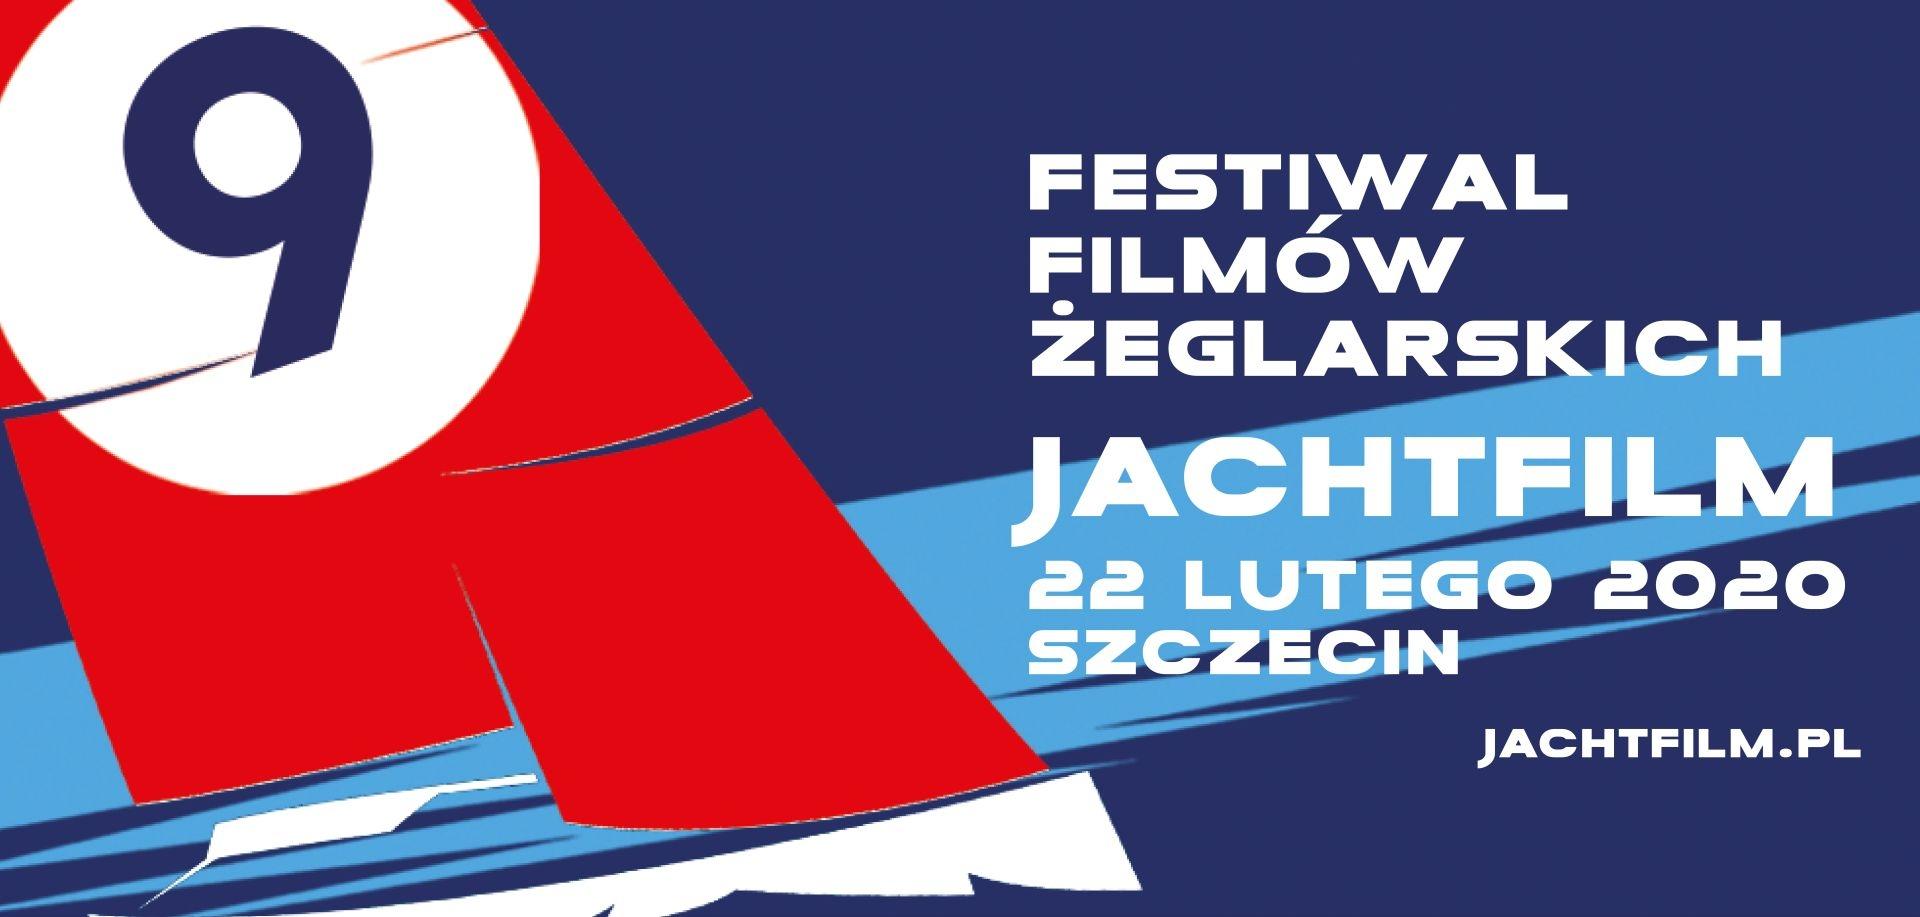 9. Festiwal Filmów Żeglarskich Jachtfilm